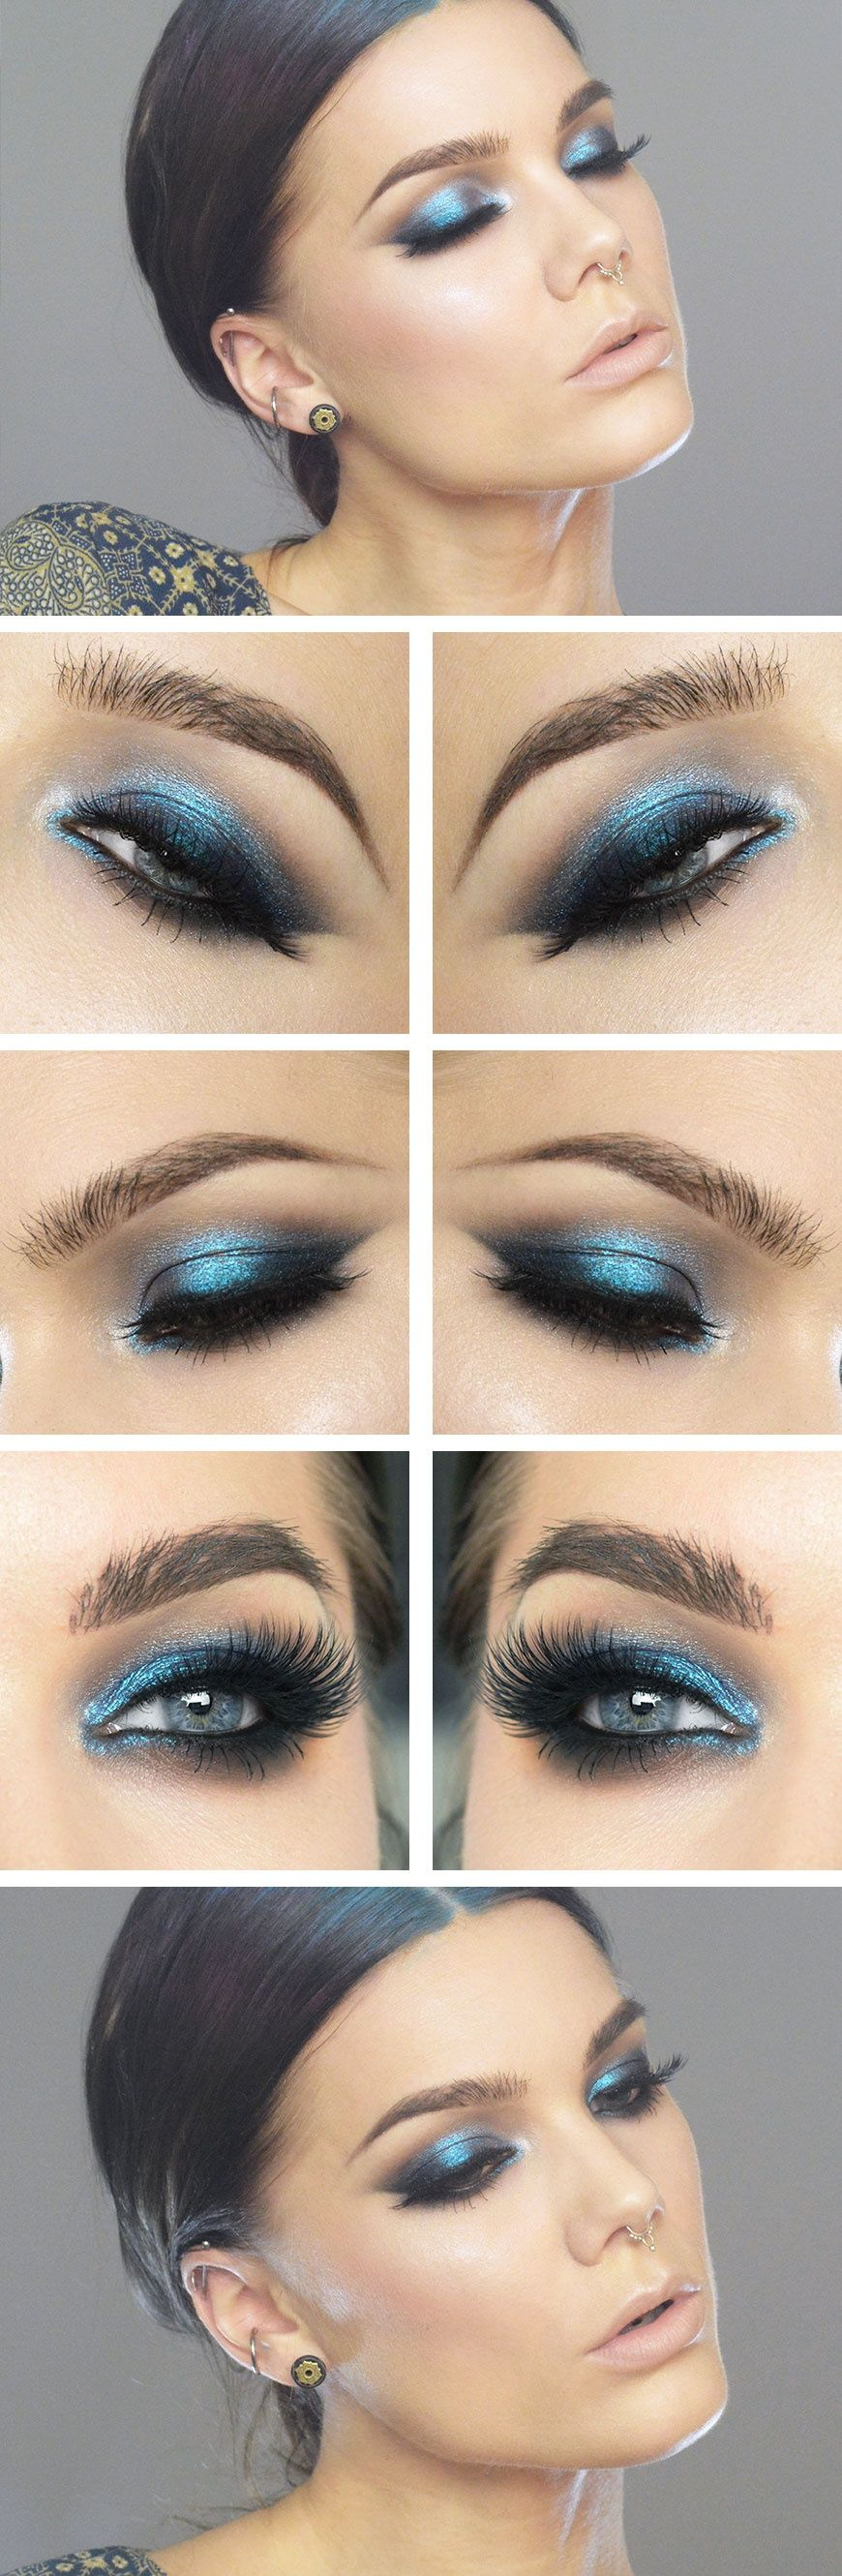 Blue envy linda hallberg beat for jesus pinterest makeup